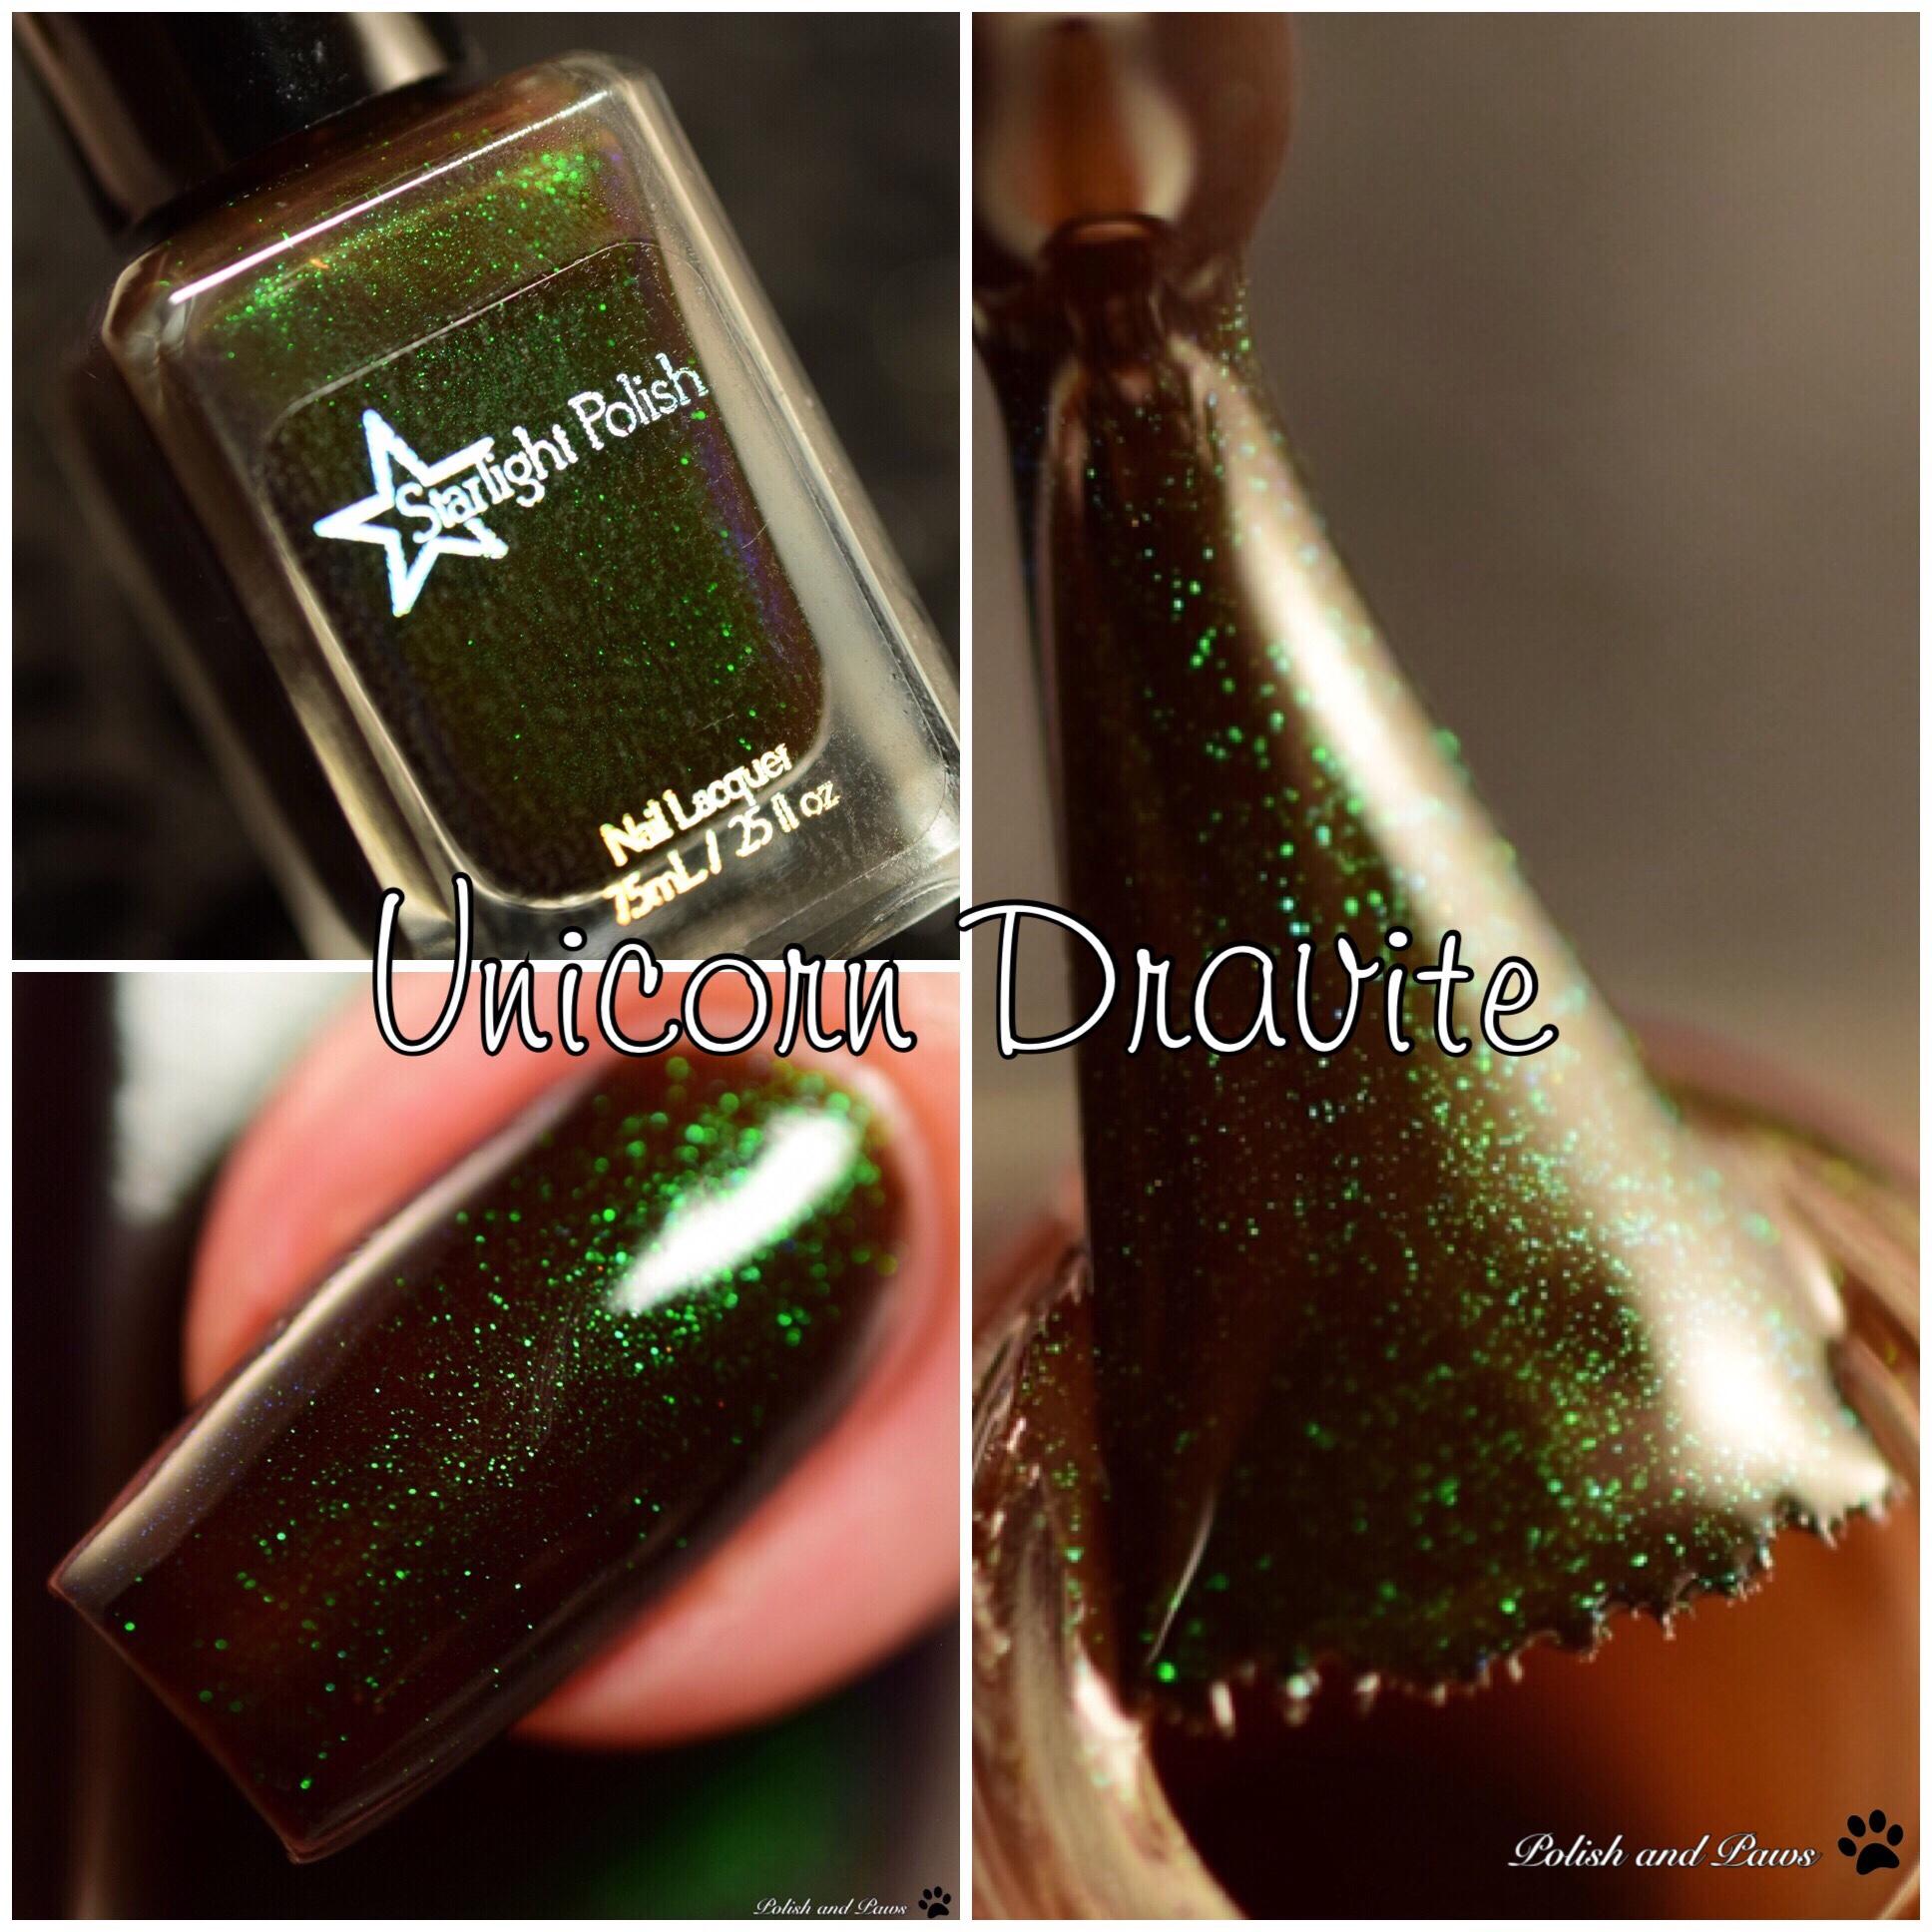 Starlight Polish Unicorn Dravite